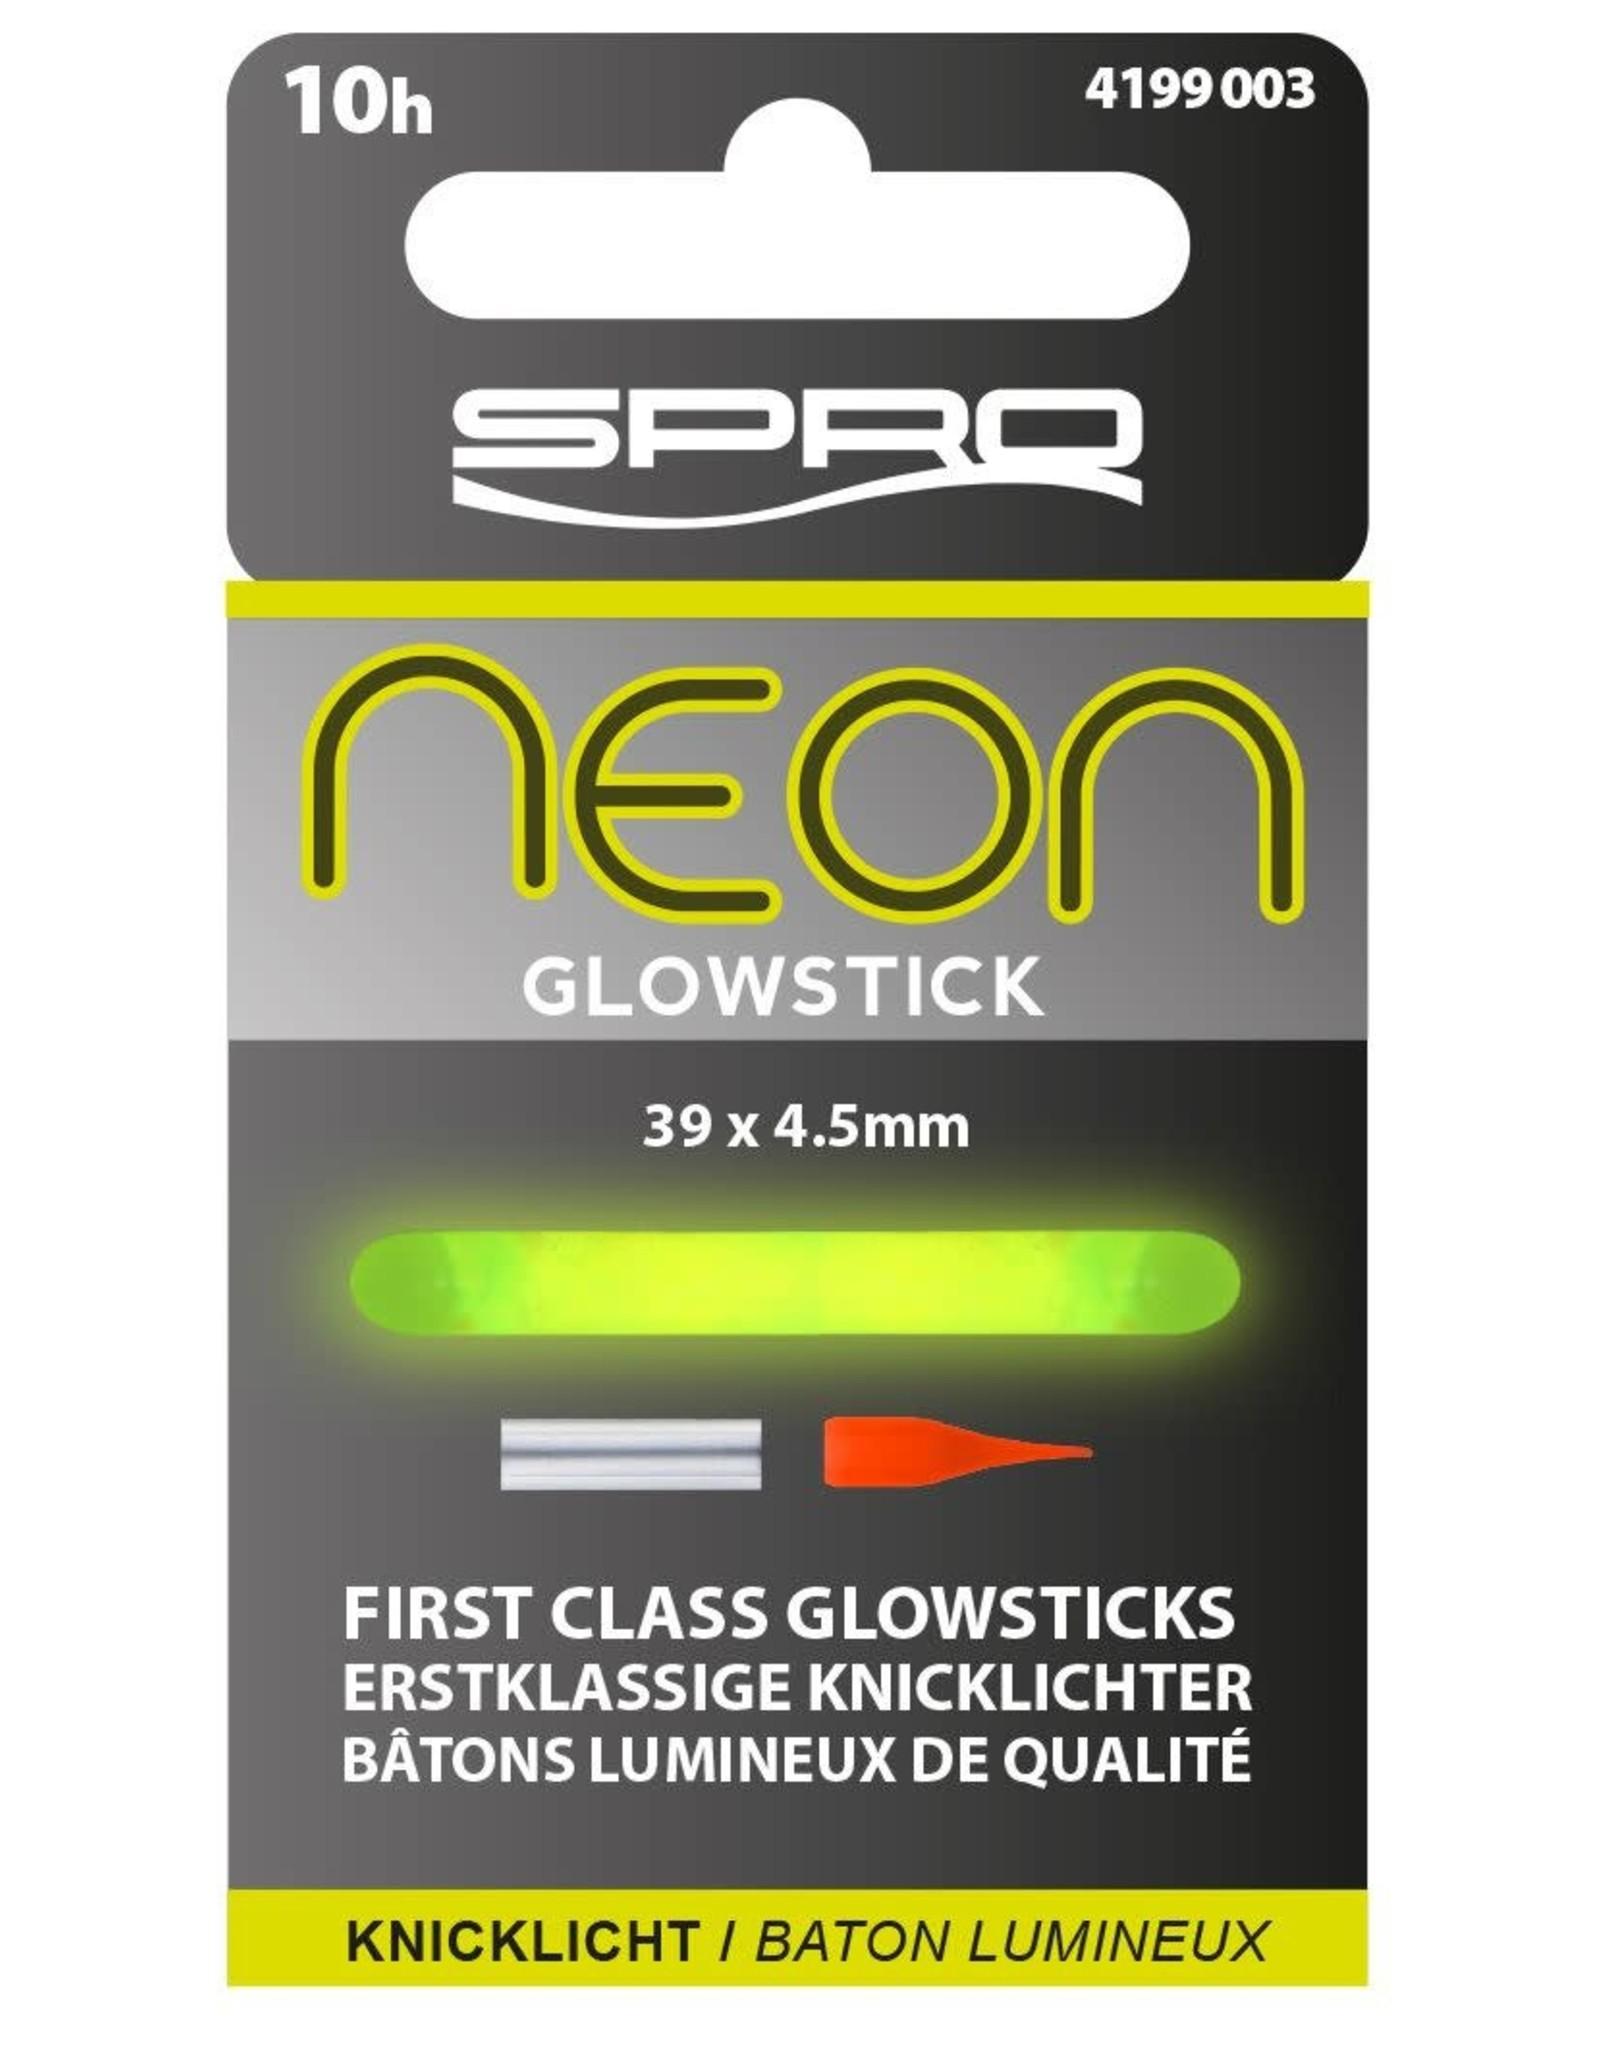 SPRO NEON GLOWSTICK GREEN 39X4.5MM